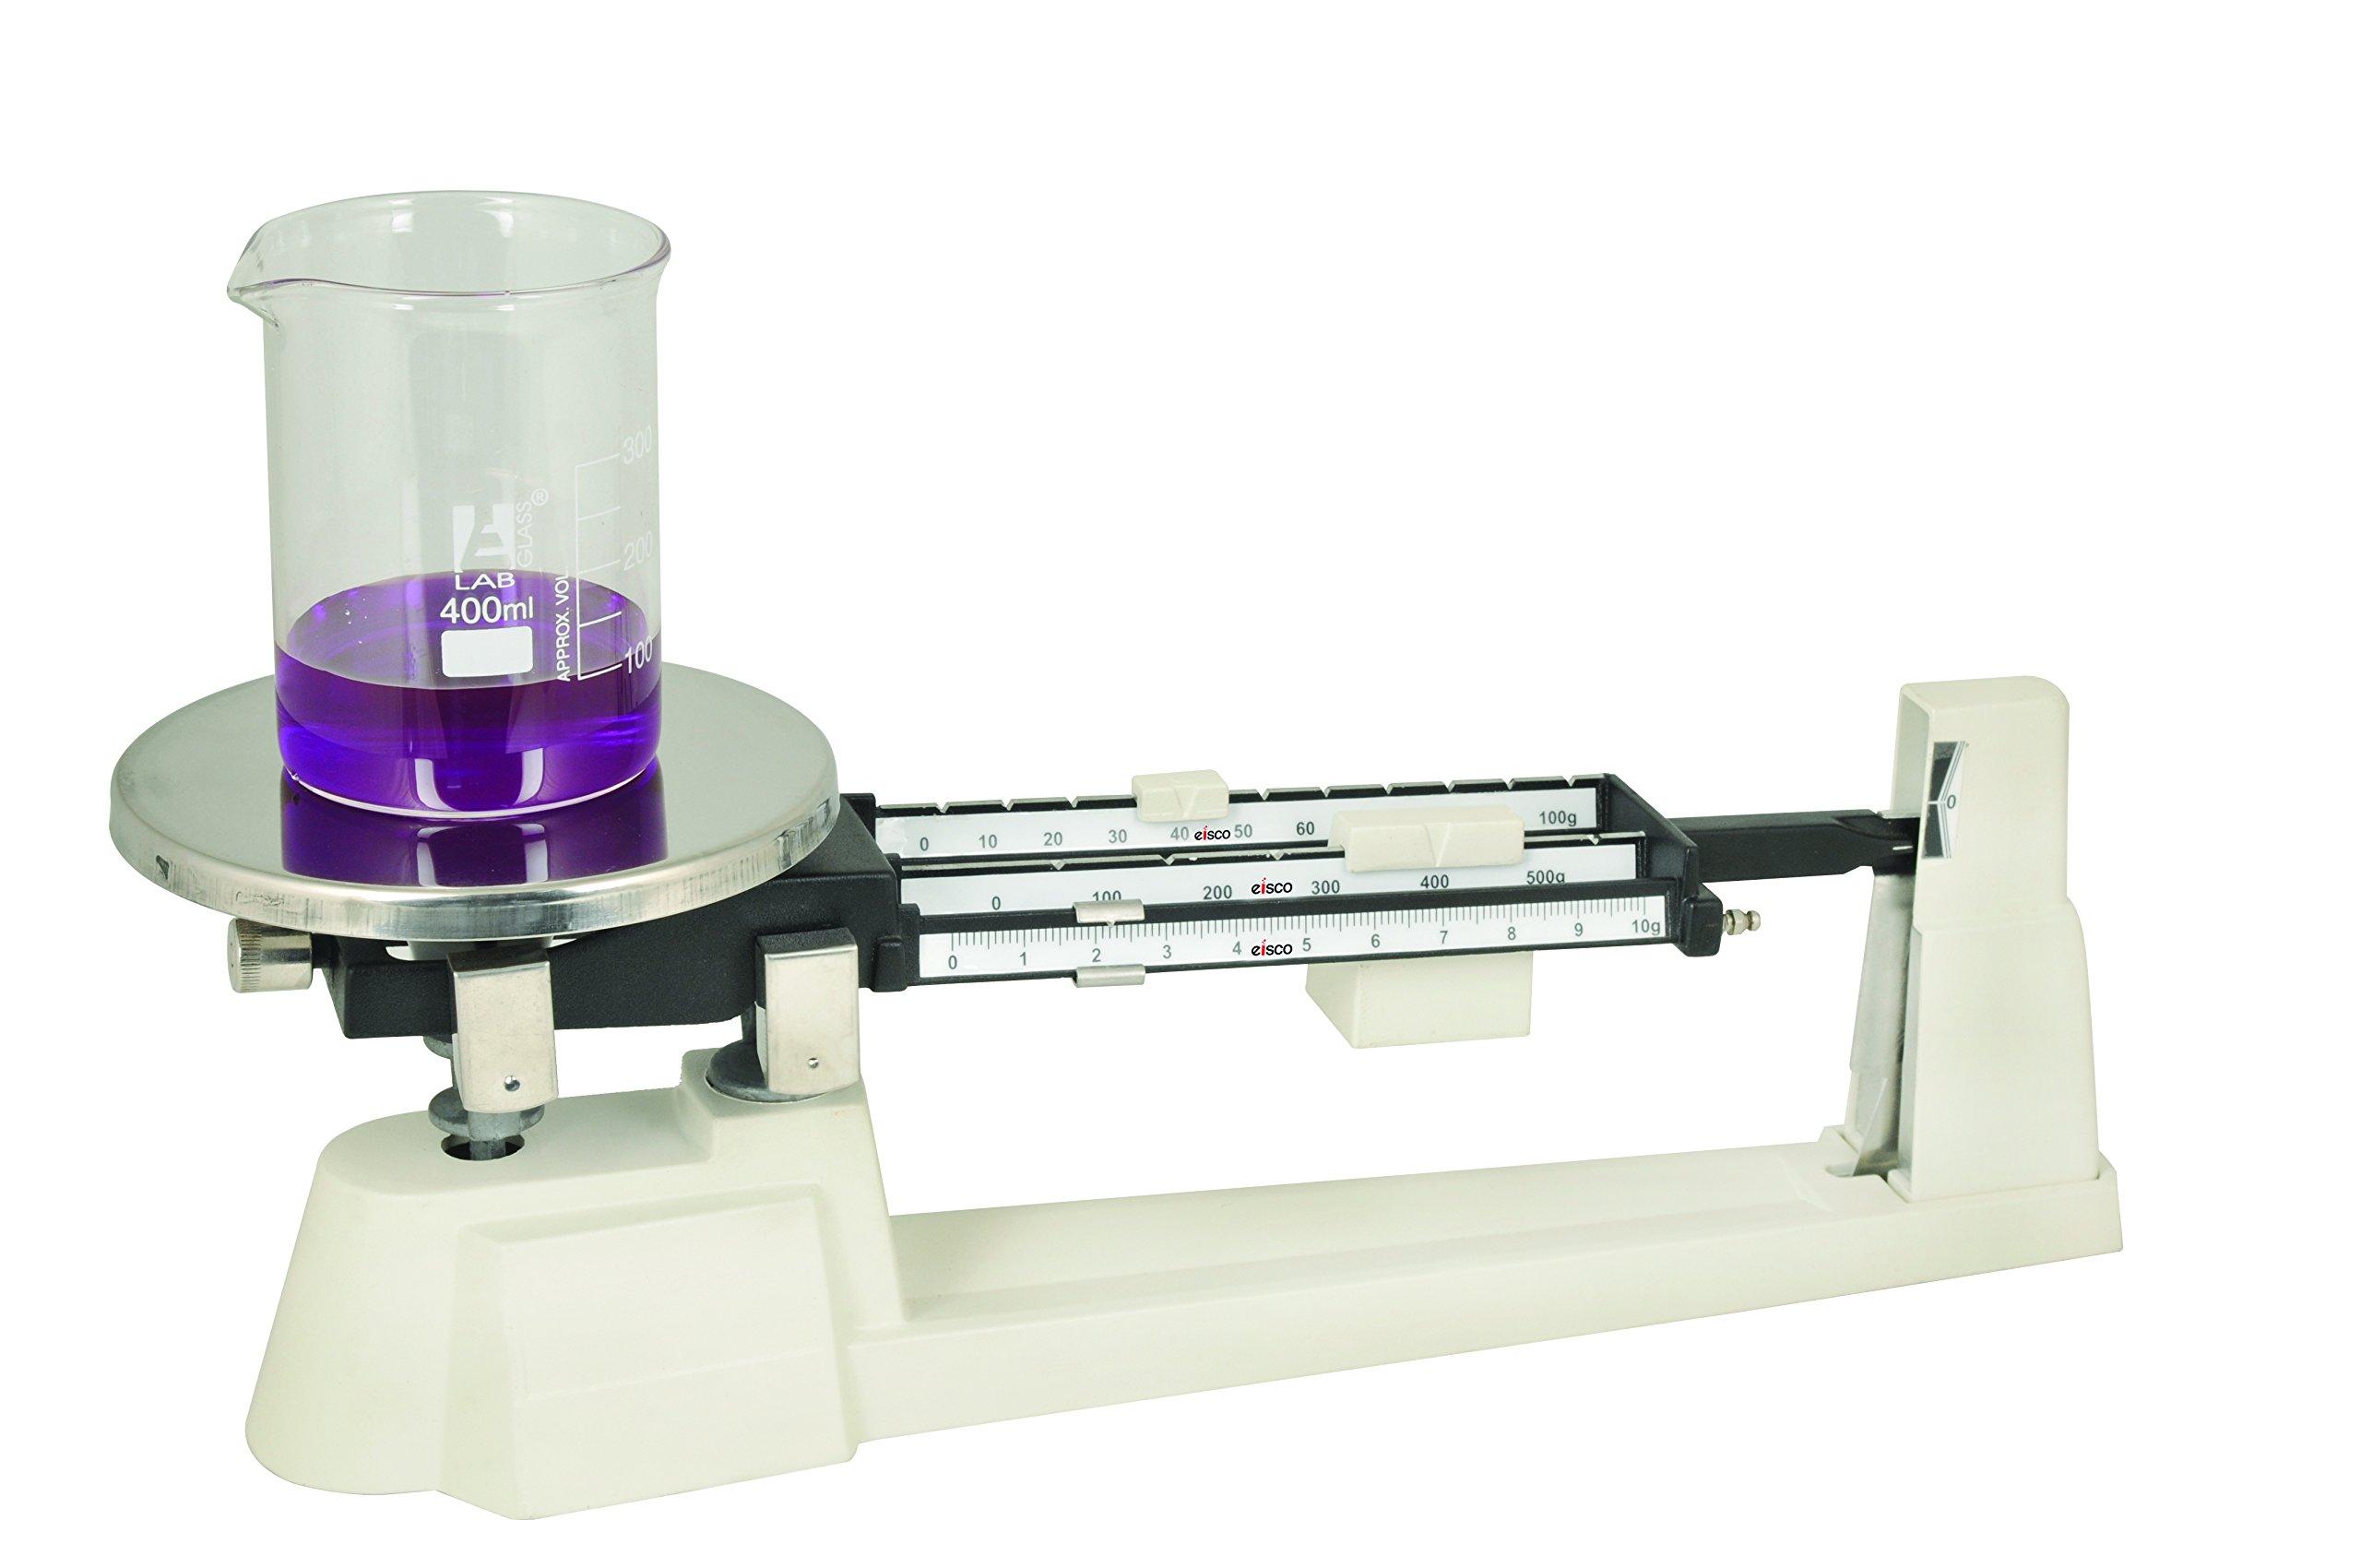 Eisco Labs Triple Beam Balance, 610g Capacity, 0.1g Sensitivity